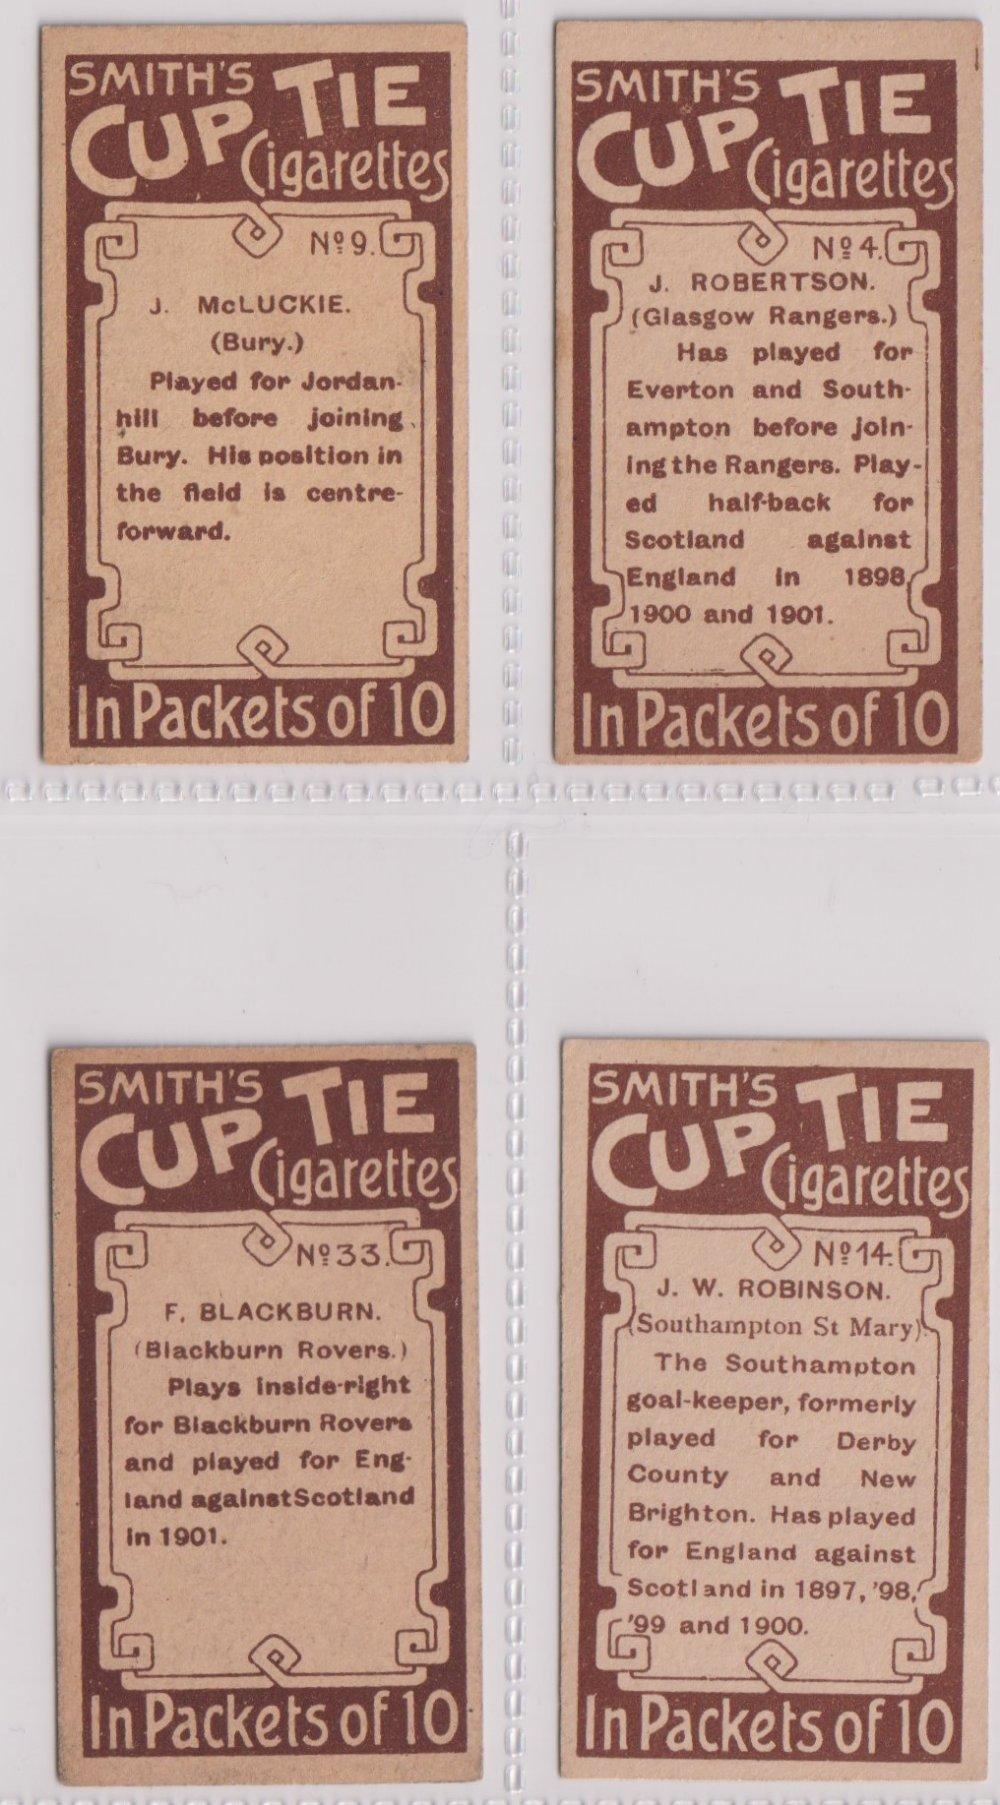 Cigarette cards, Smith's, Footballers (Brown back) 4 cards nos 4, 9, 14 & 33 (sl edge knocks gen - Image 2 of 2